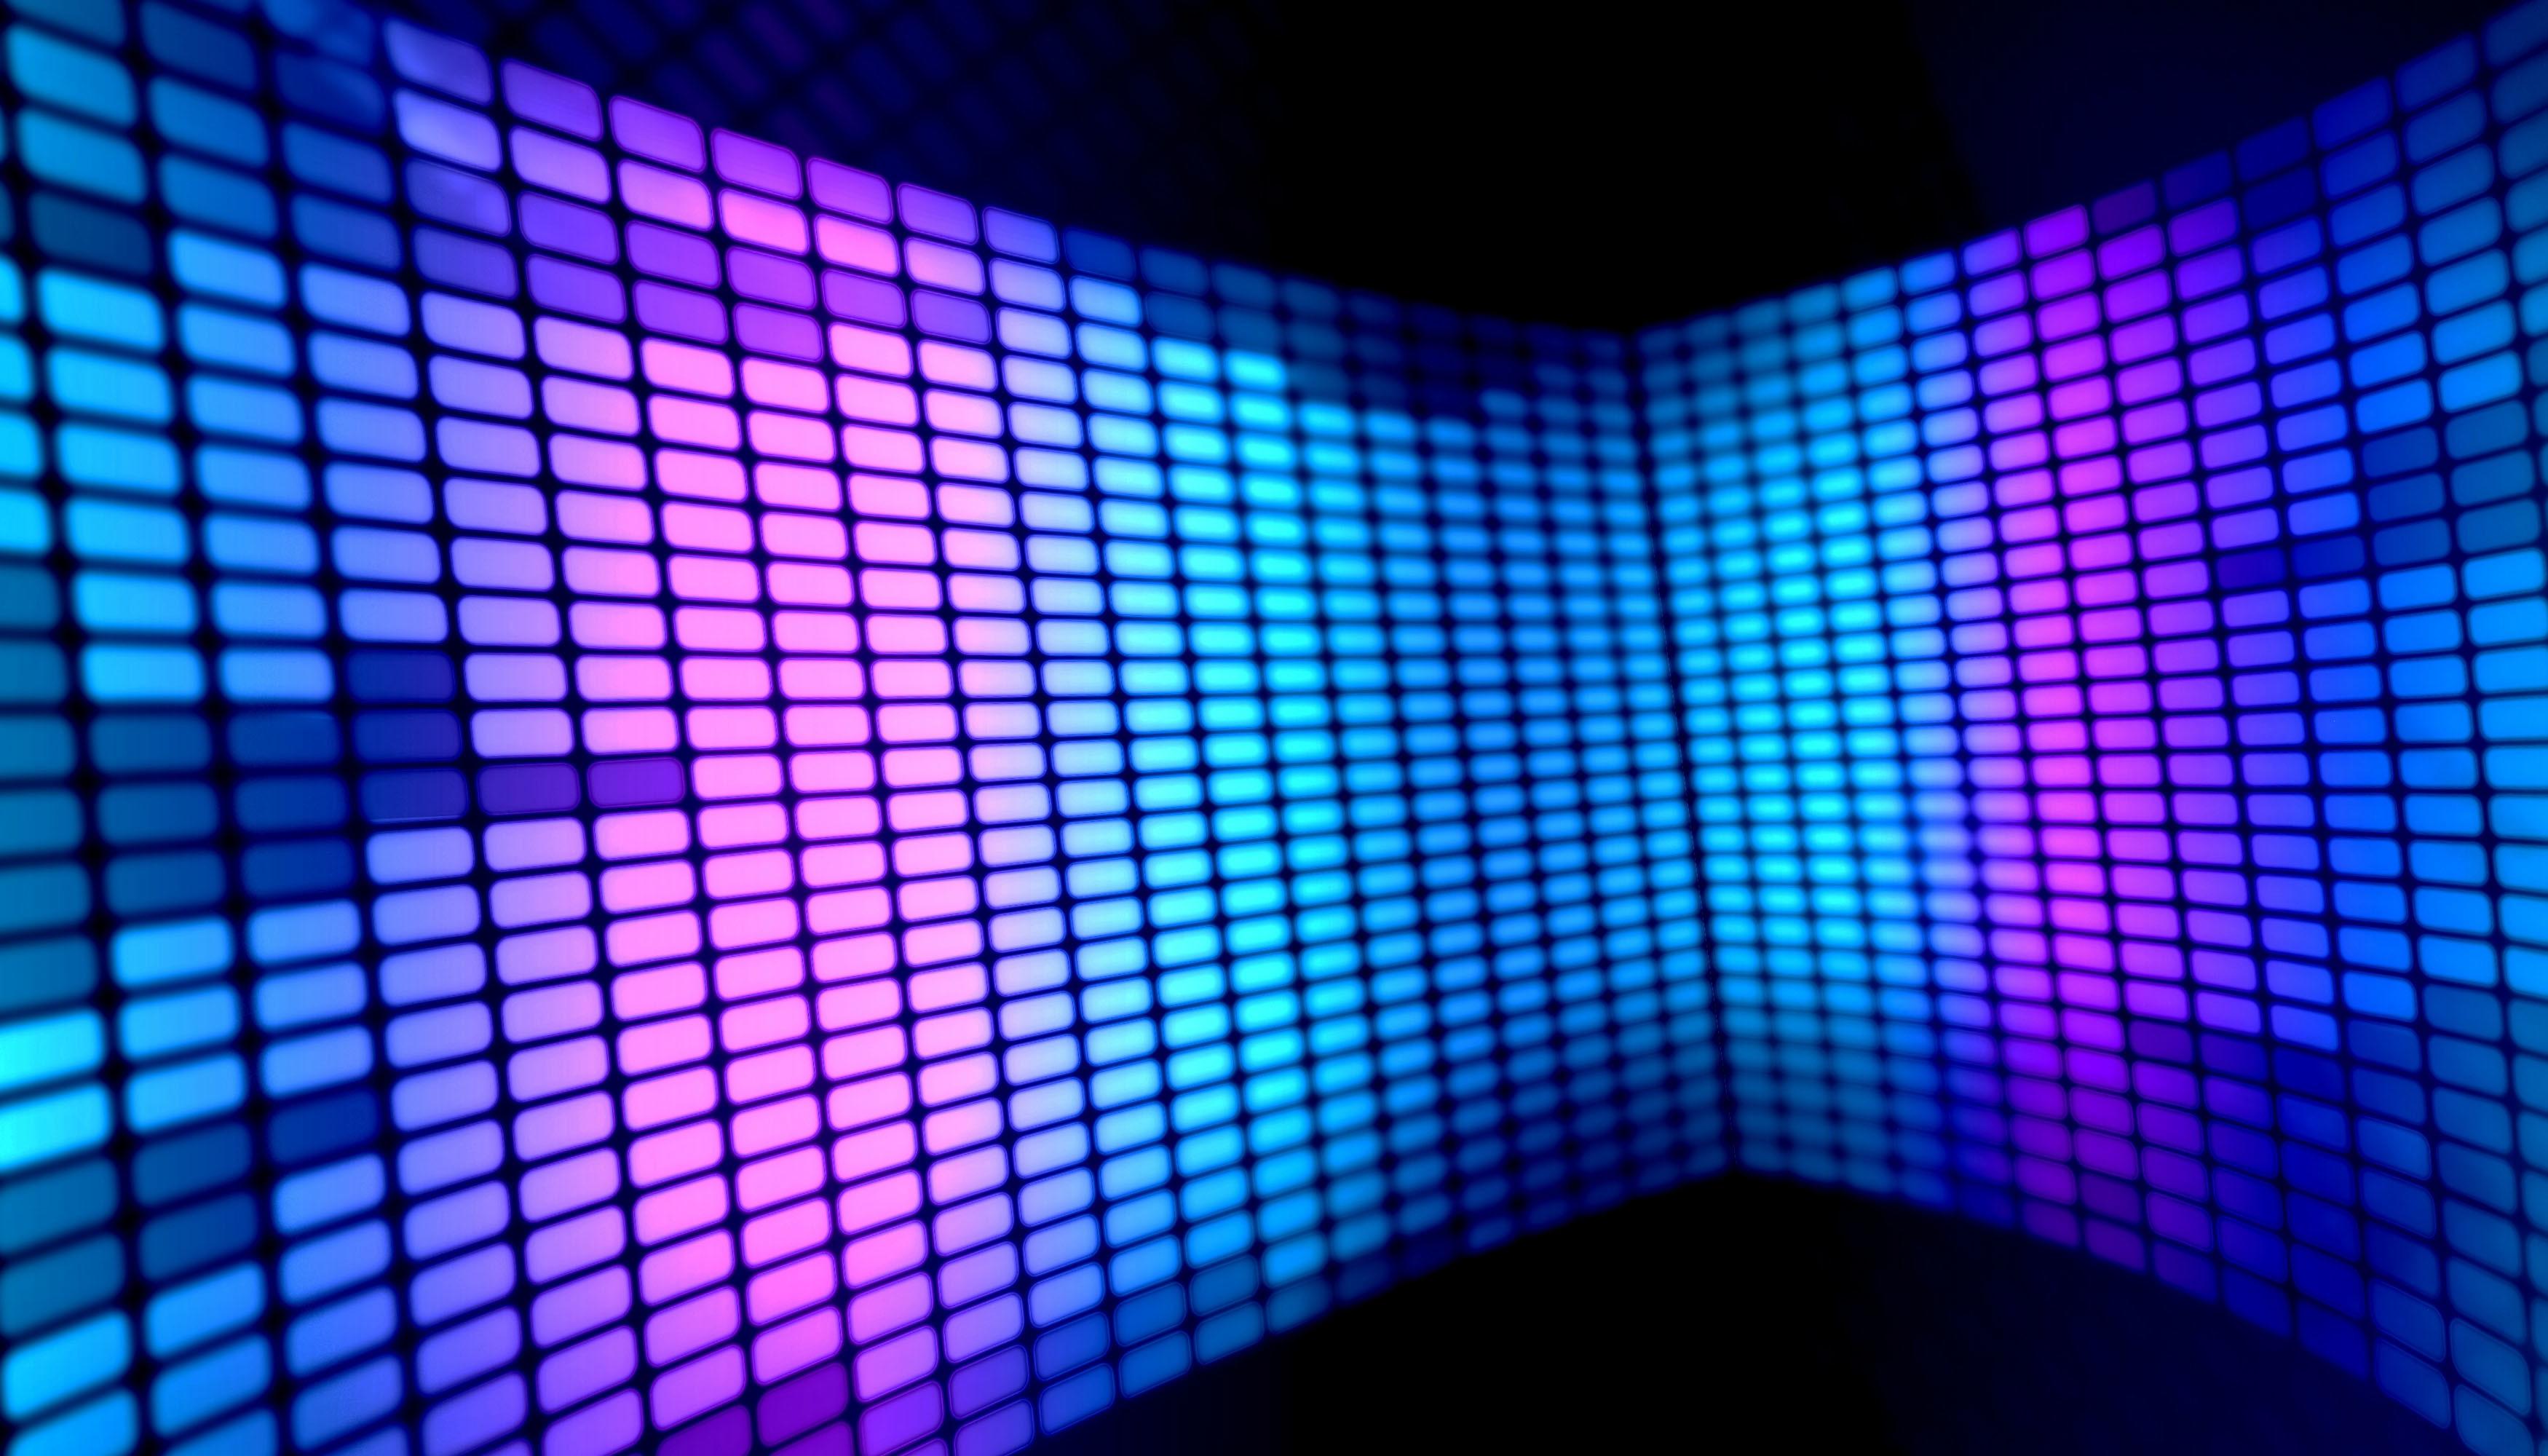 Club Lights Wallpaper